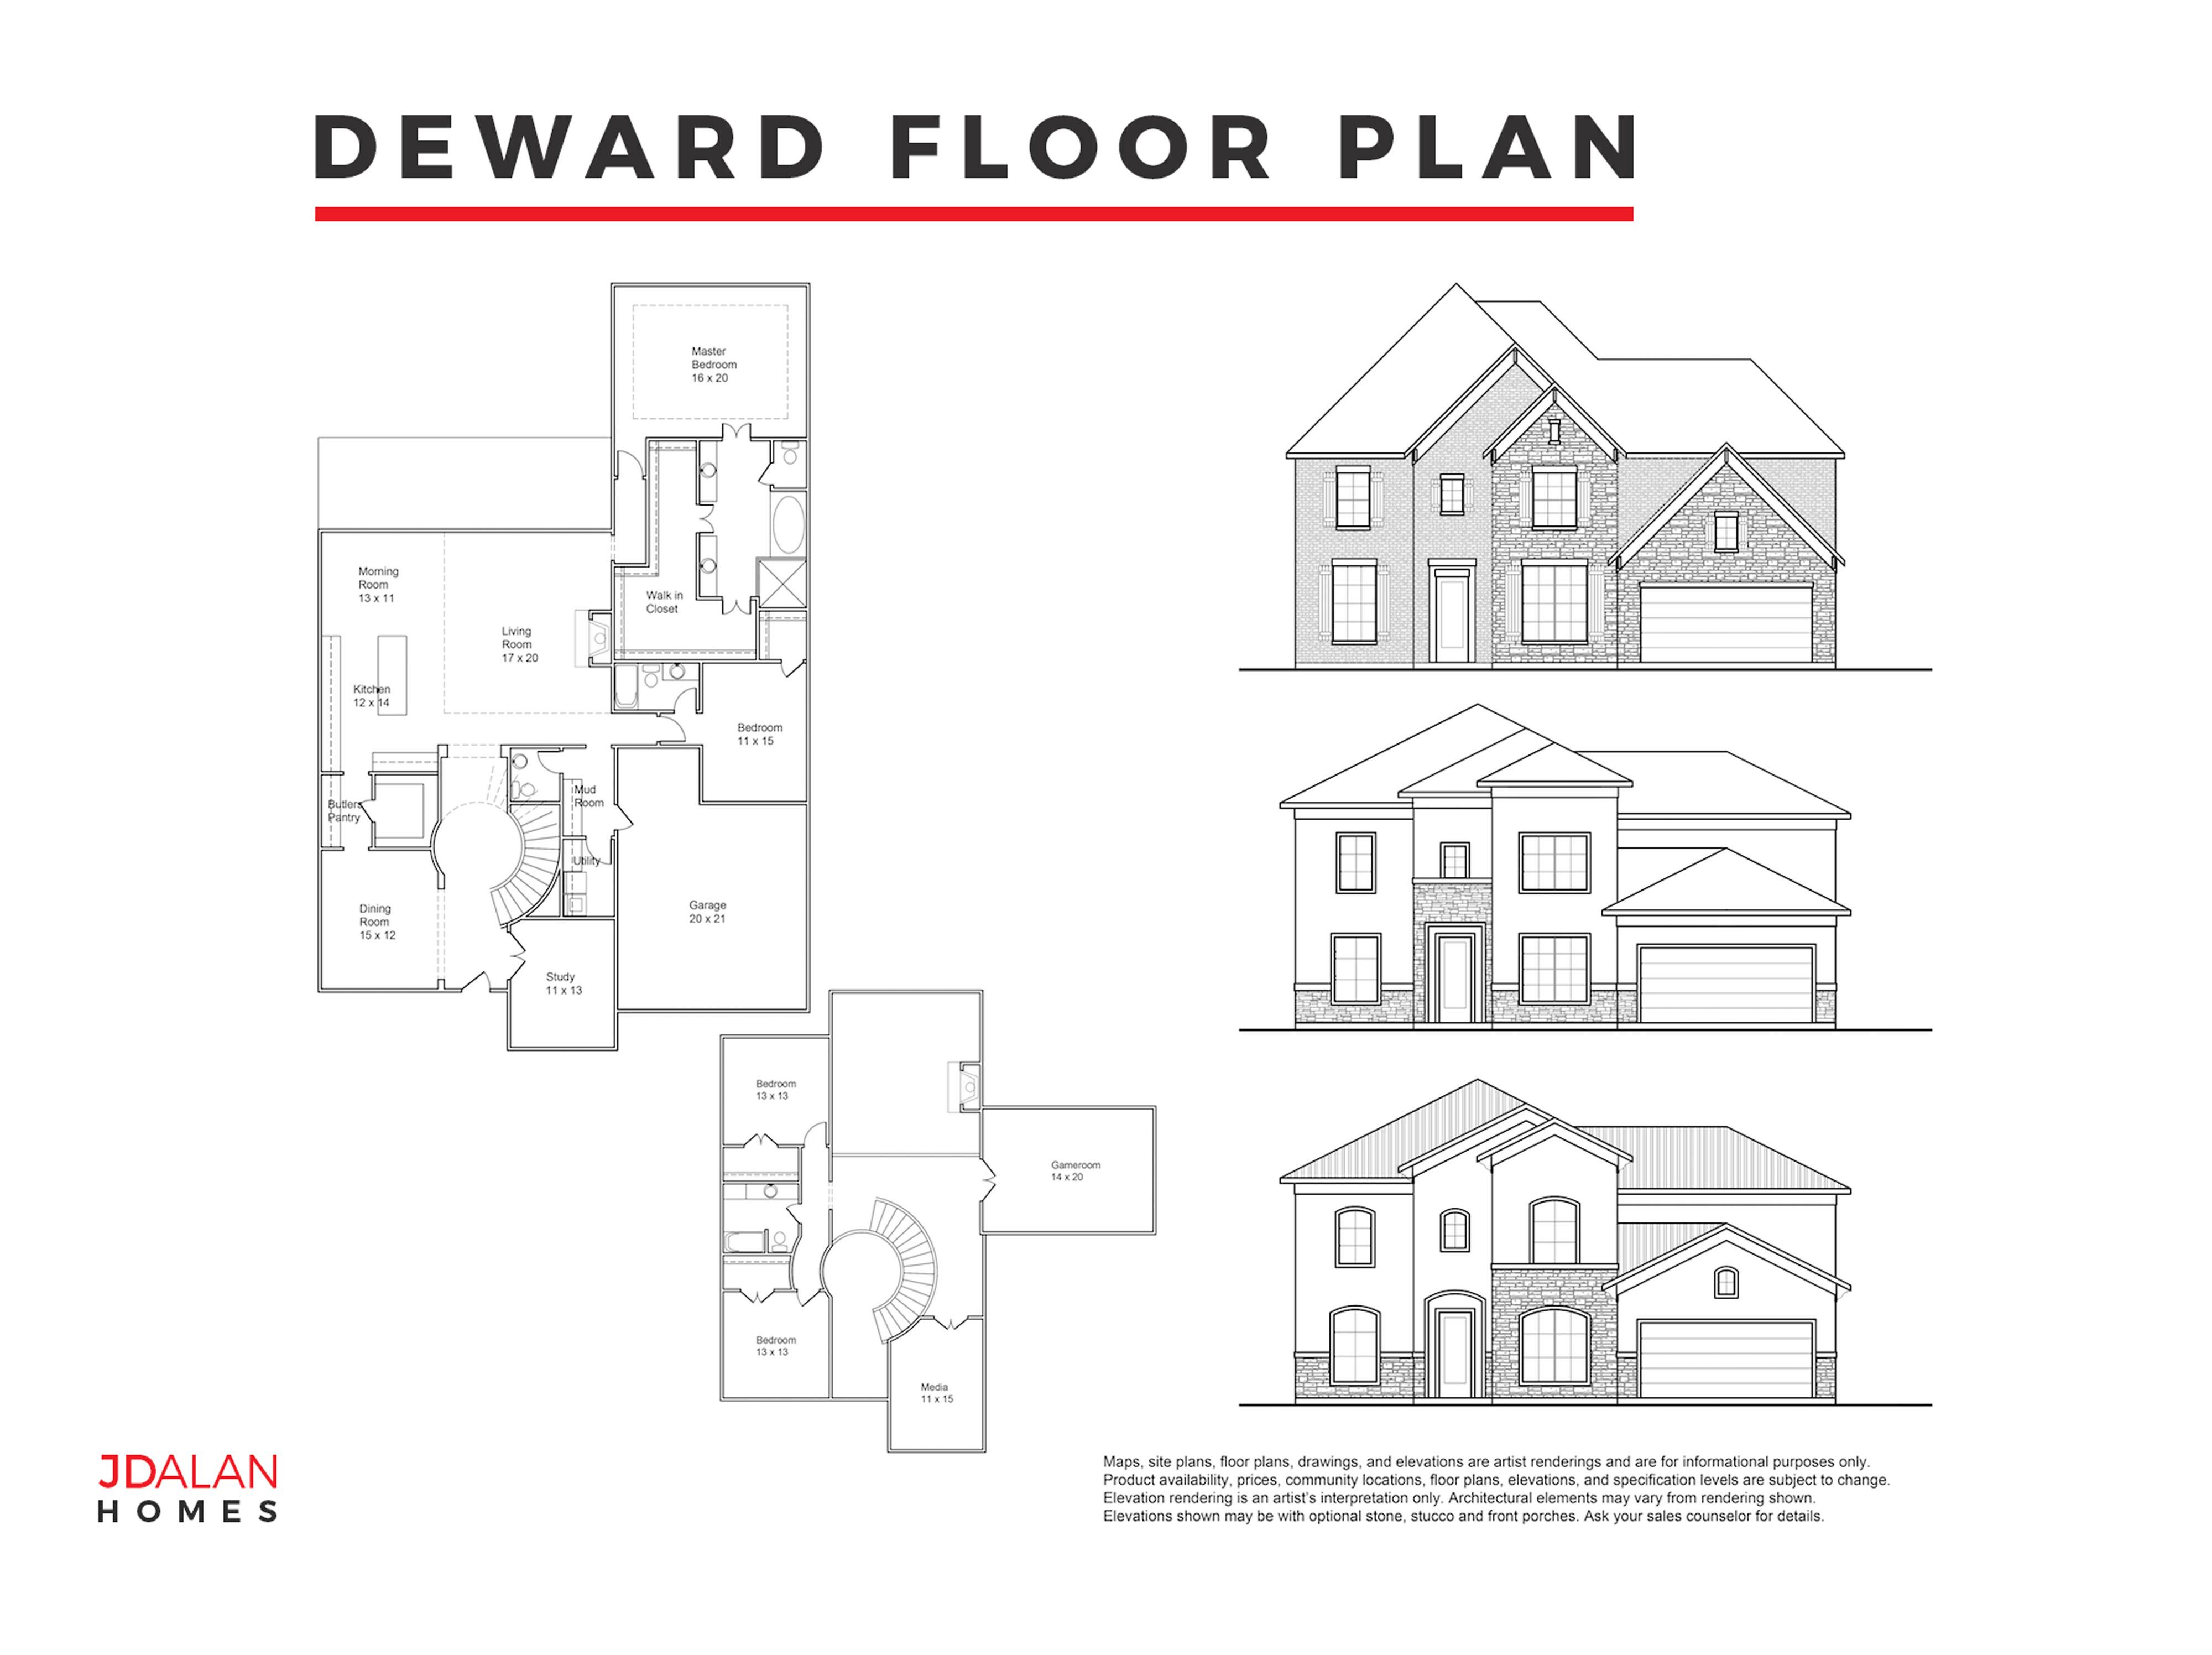 DEWARD FLOOR PLAN #3994